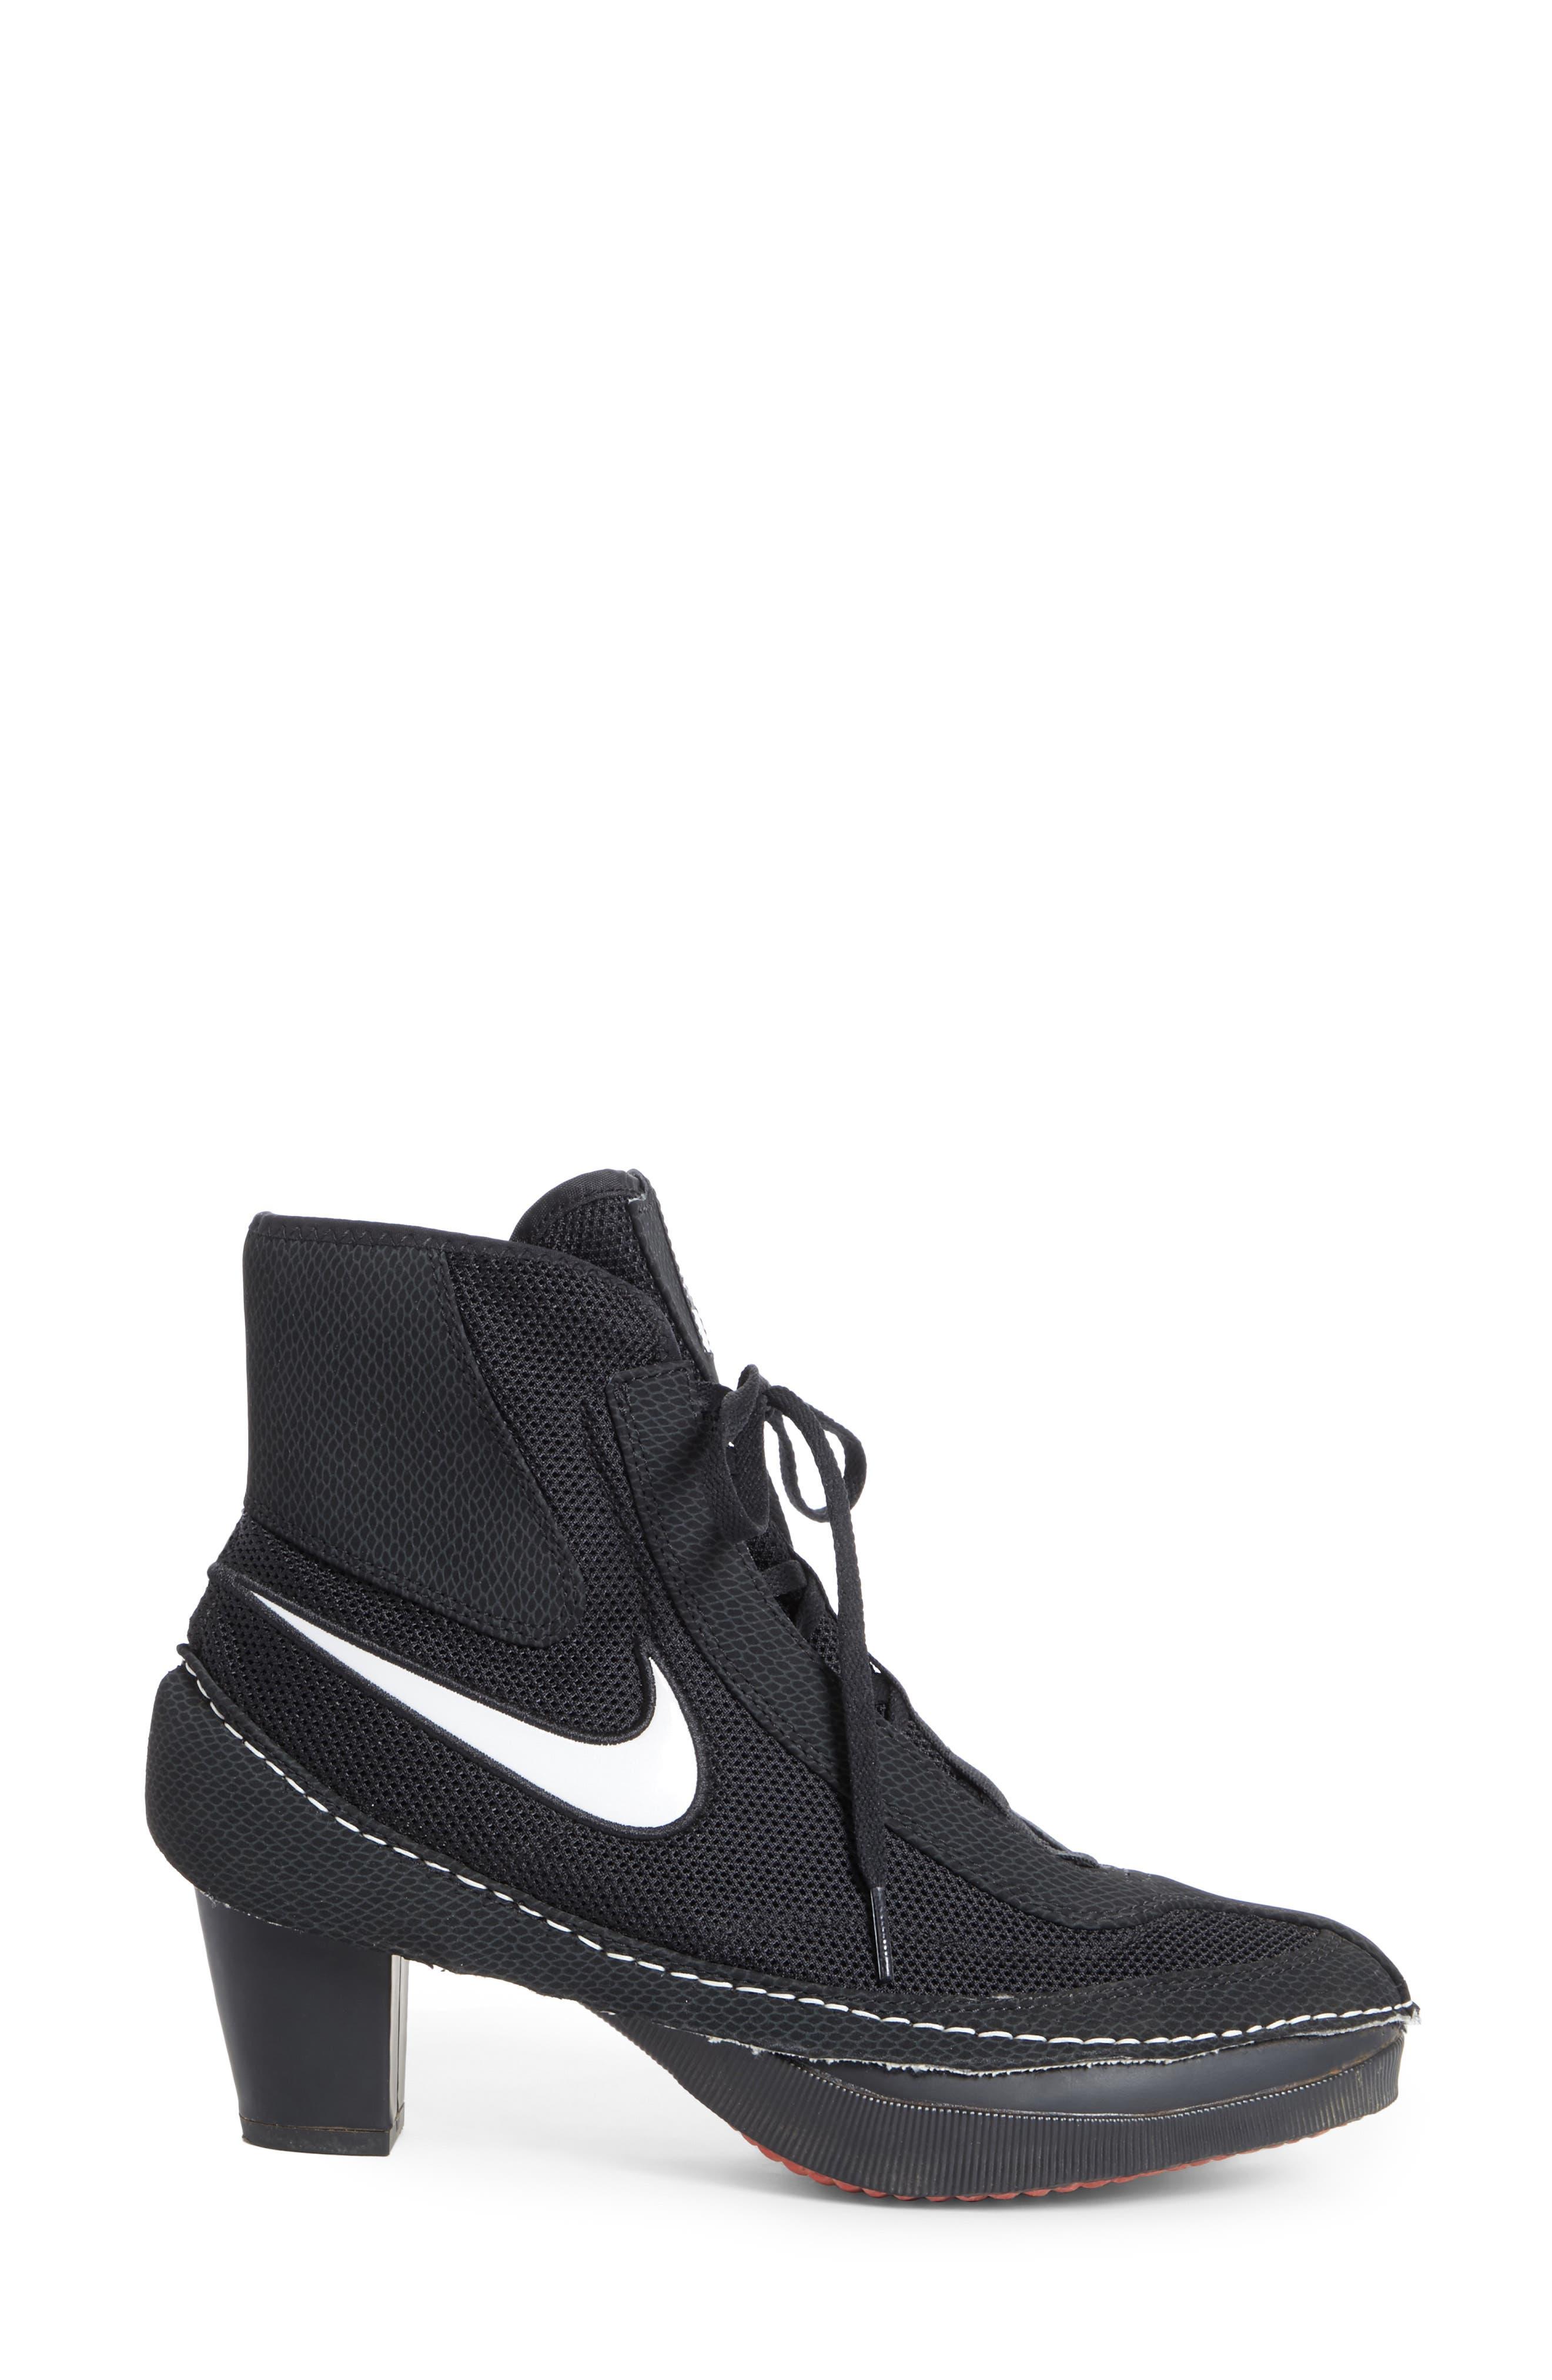 x Nike Heeled Bootie,                             Alternate thumbnail 3, color,                             BLACK